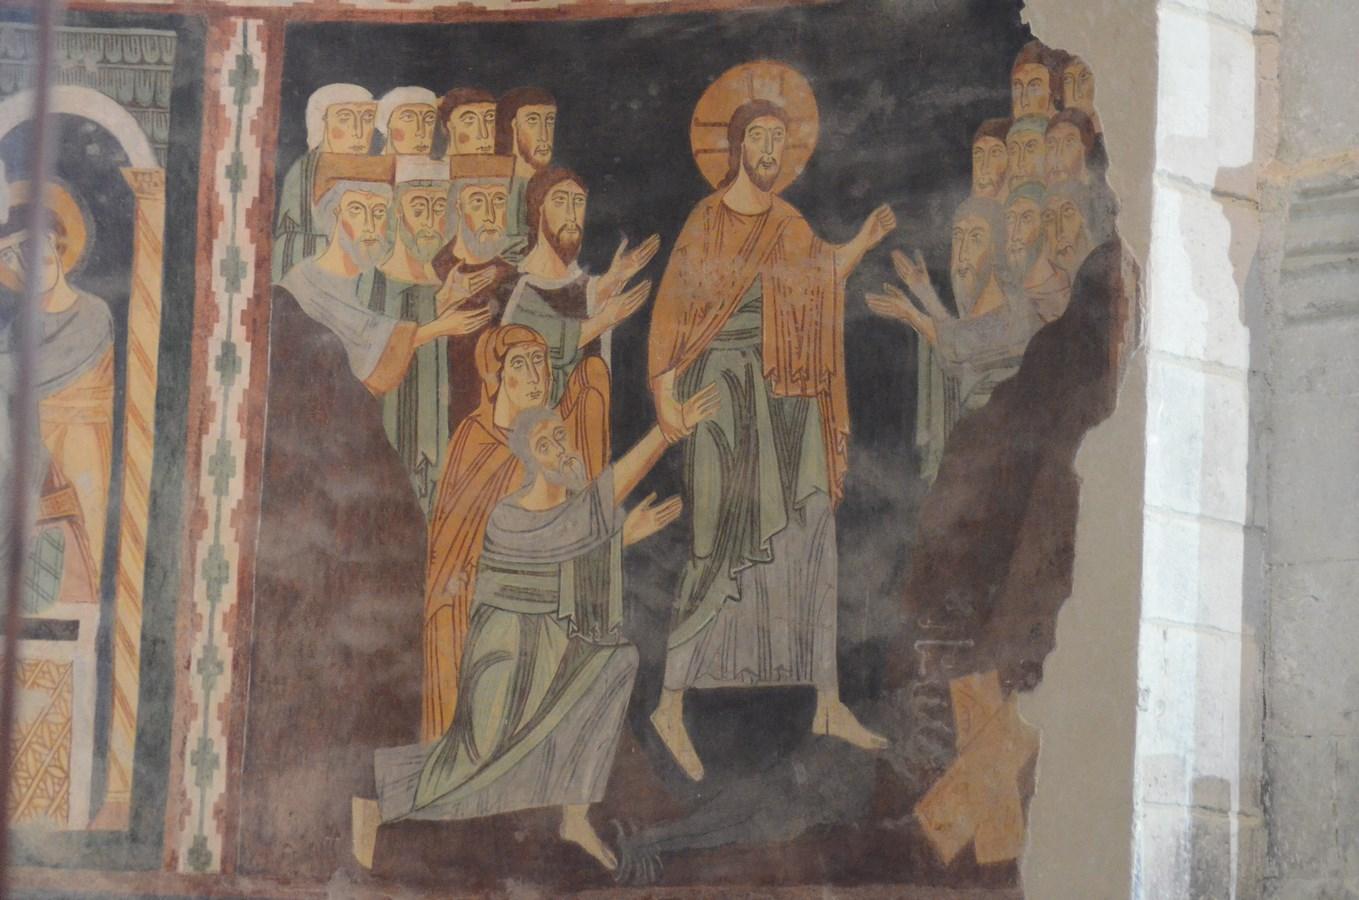 Santissima Trinità di Saccargia, Romanisches Fresko